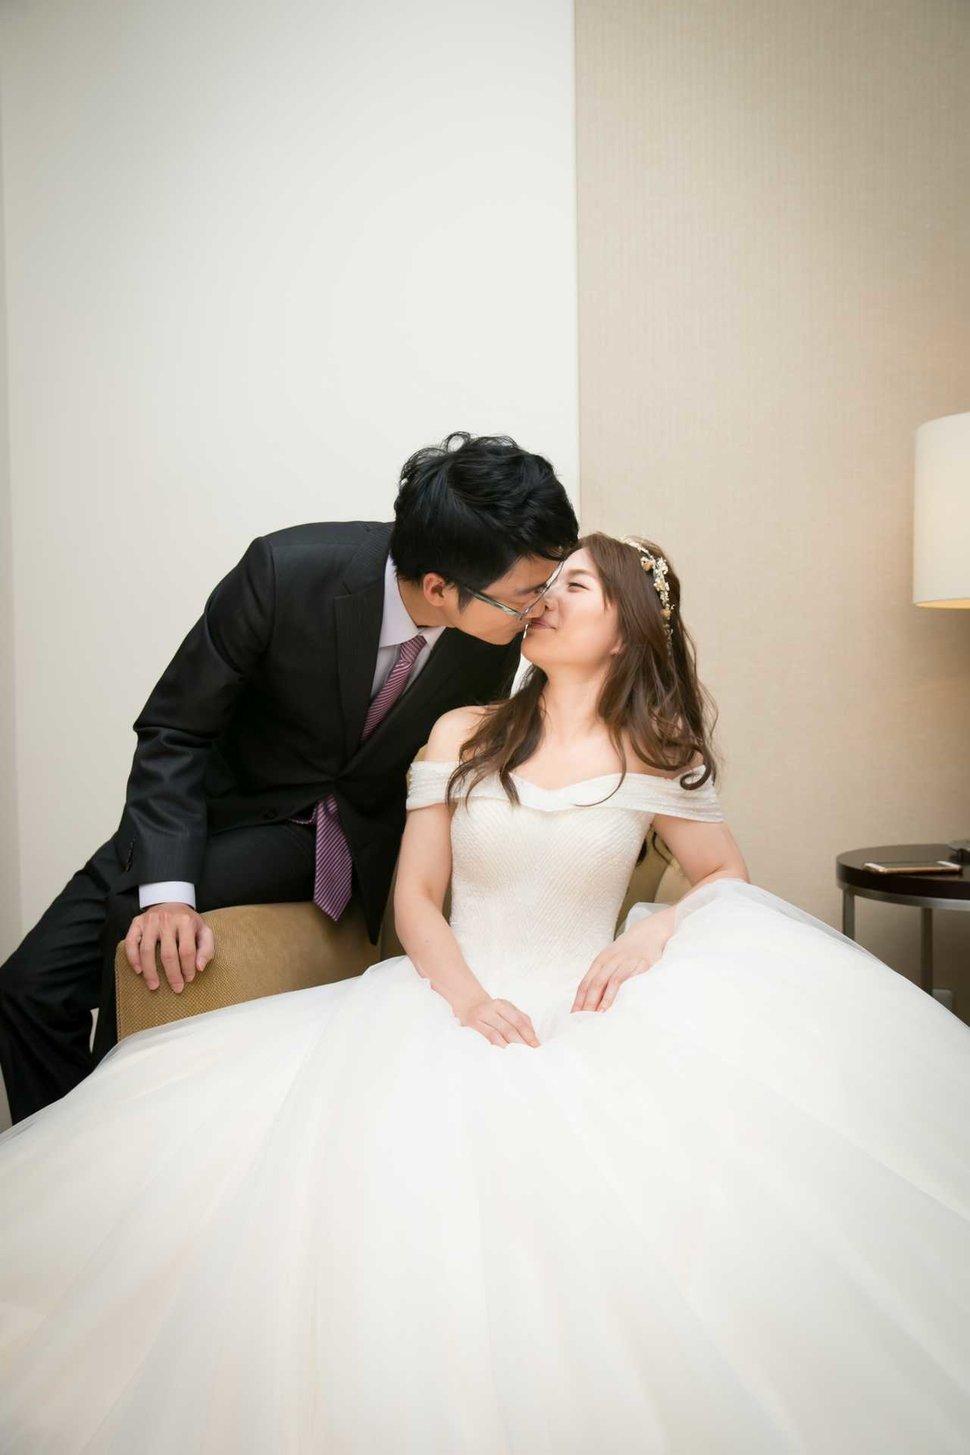 Wedding_Photo_2016_011 - 新竹婚禮攝影師Donger-婚攝東哥《結婚吧》